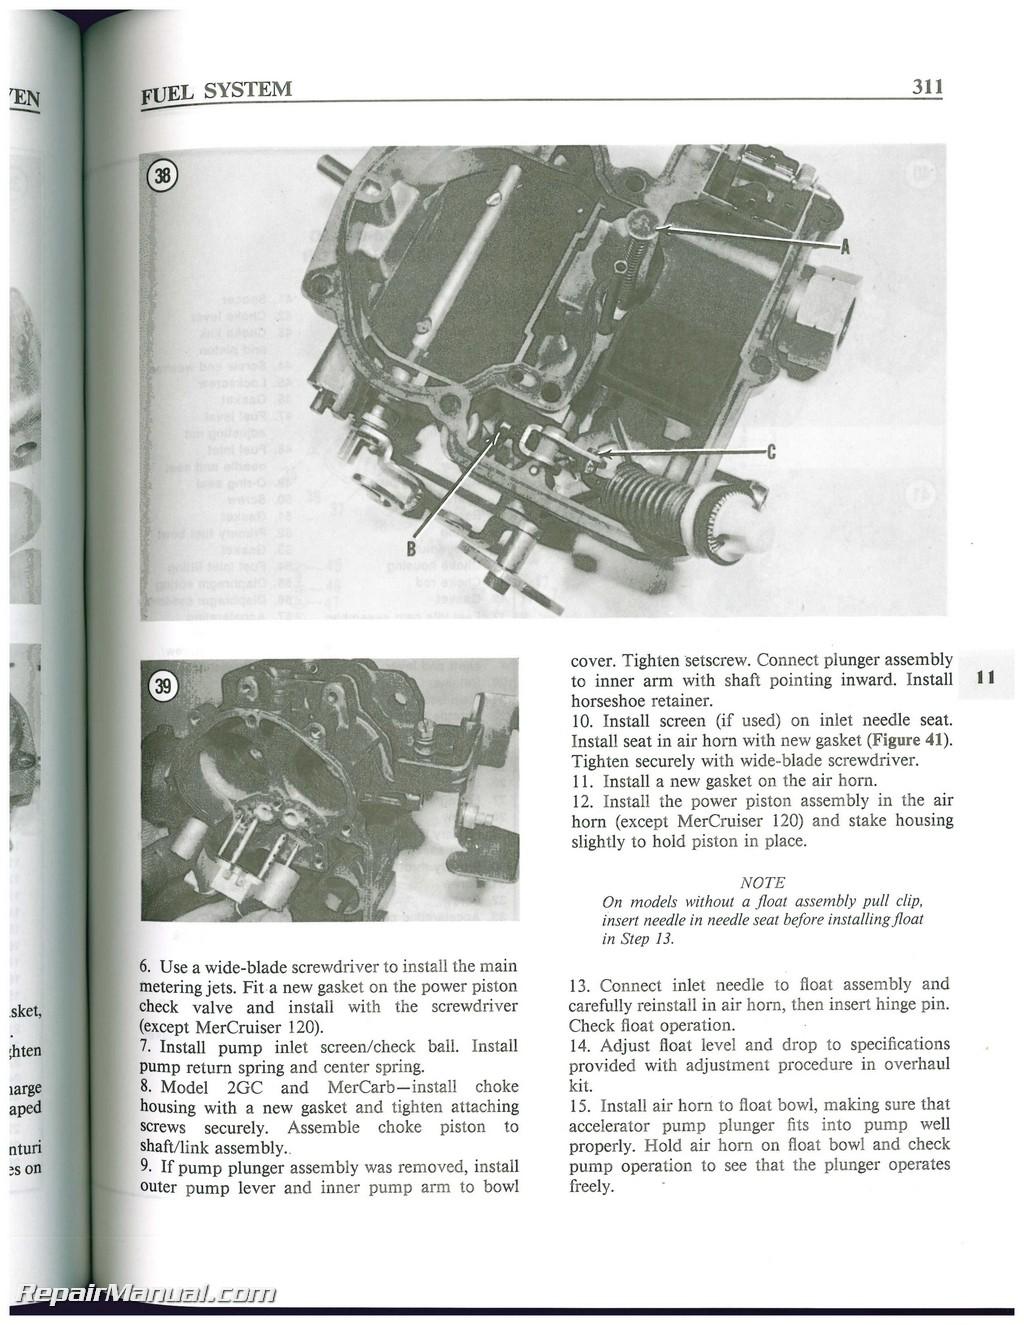 120 Hp Mercruiser Alternator Wiring Diagram Mercruiser 3 0 Marine